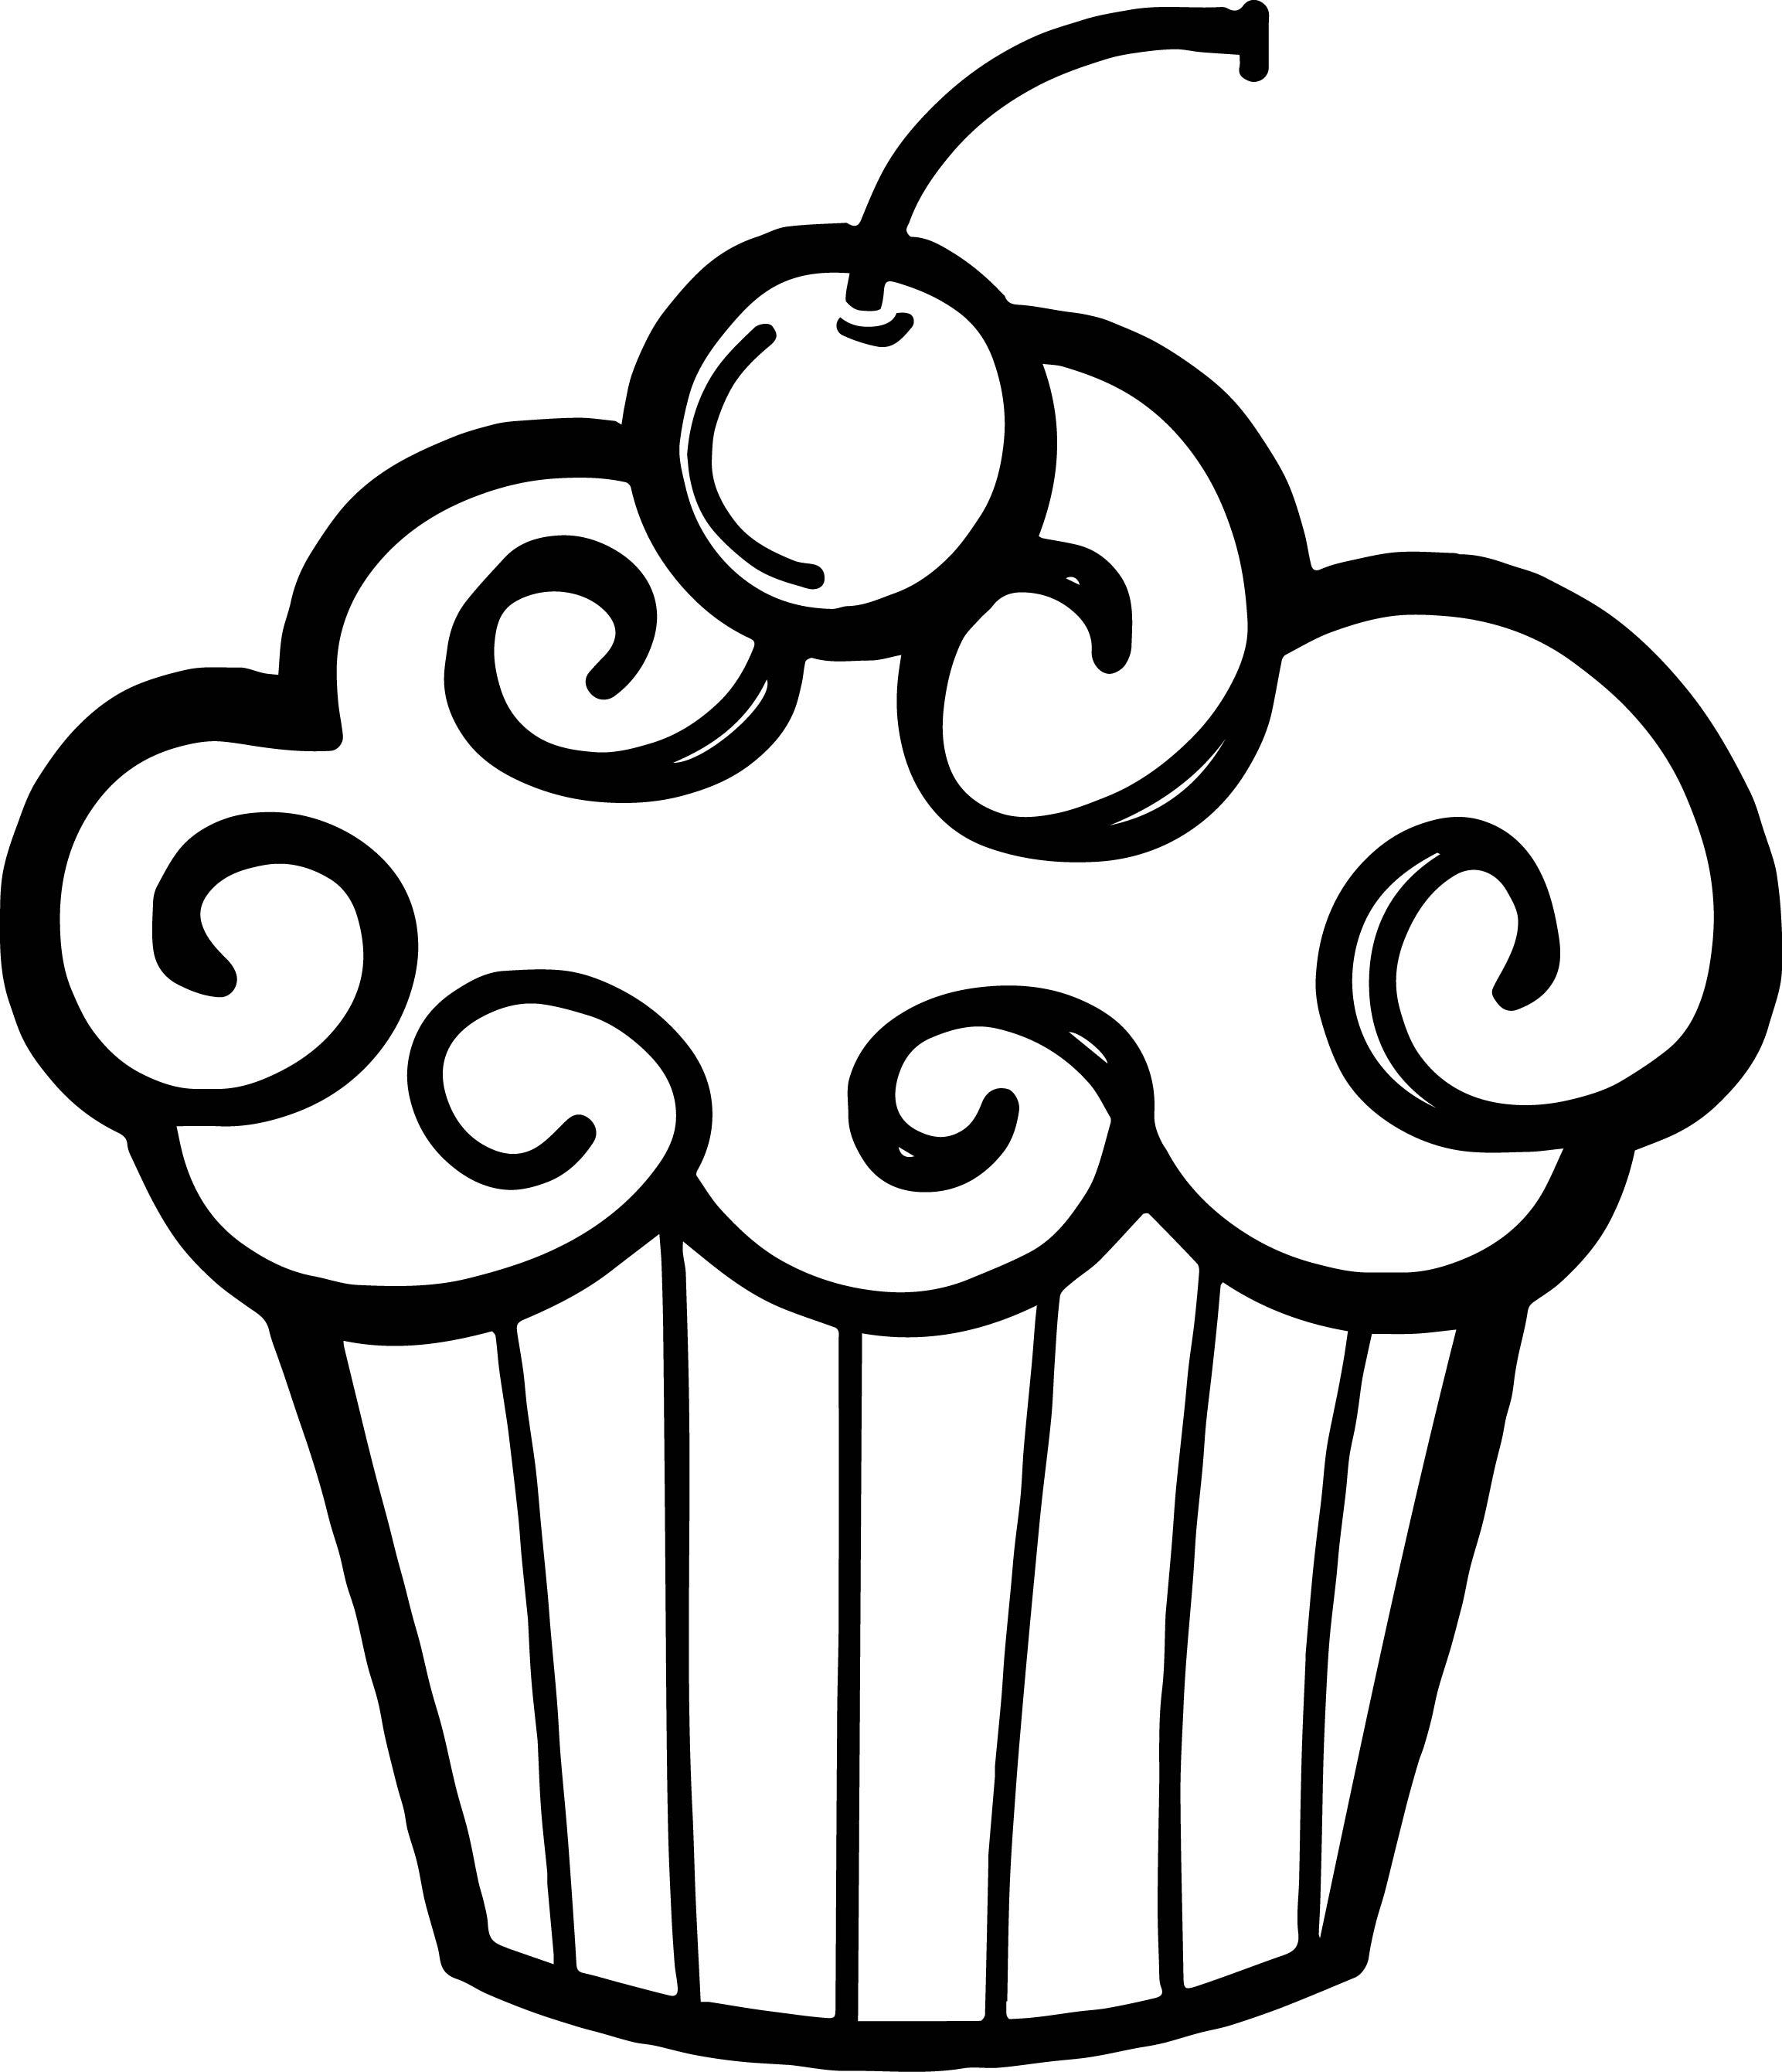 Free Dessert Clip Art Black And White, Download Free Clip.